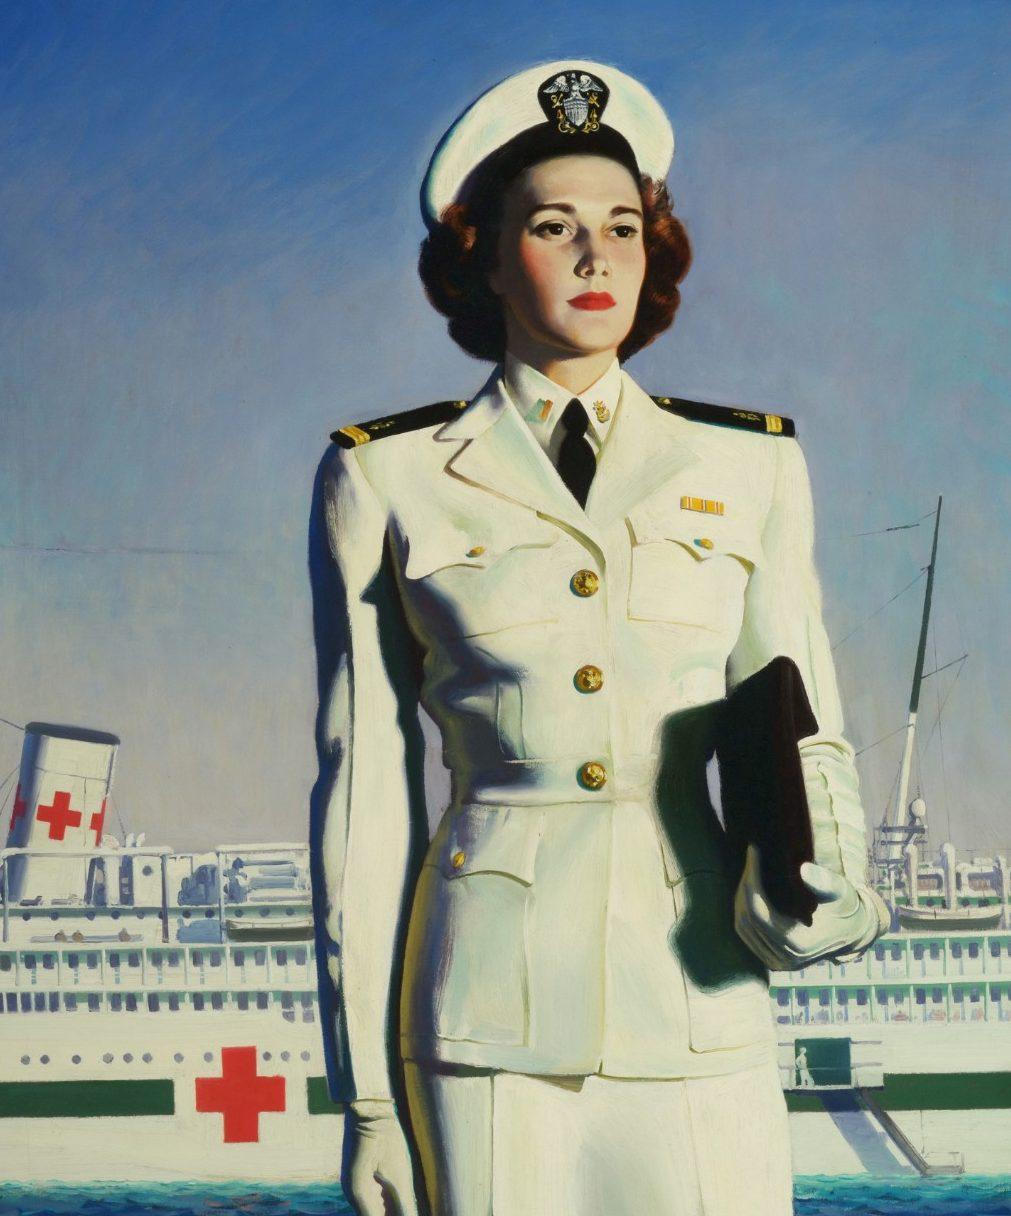 Falter John. Медсестра ВМФ.